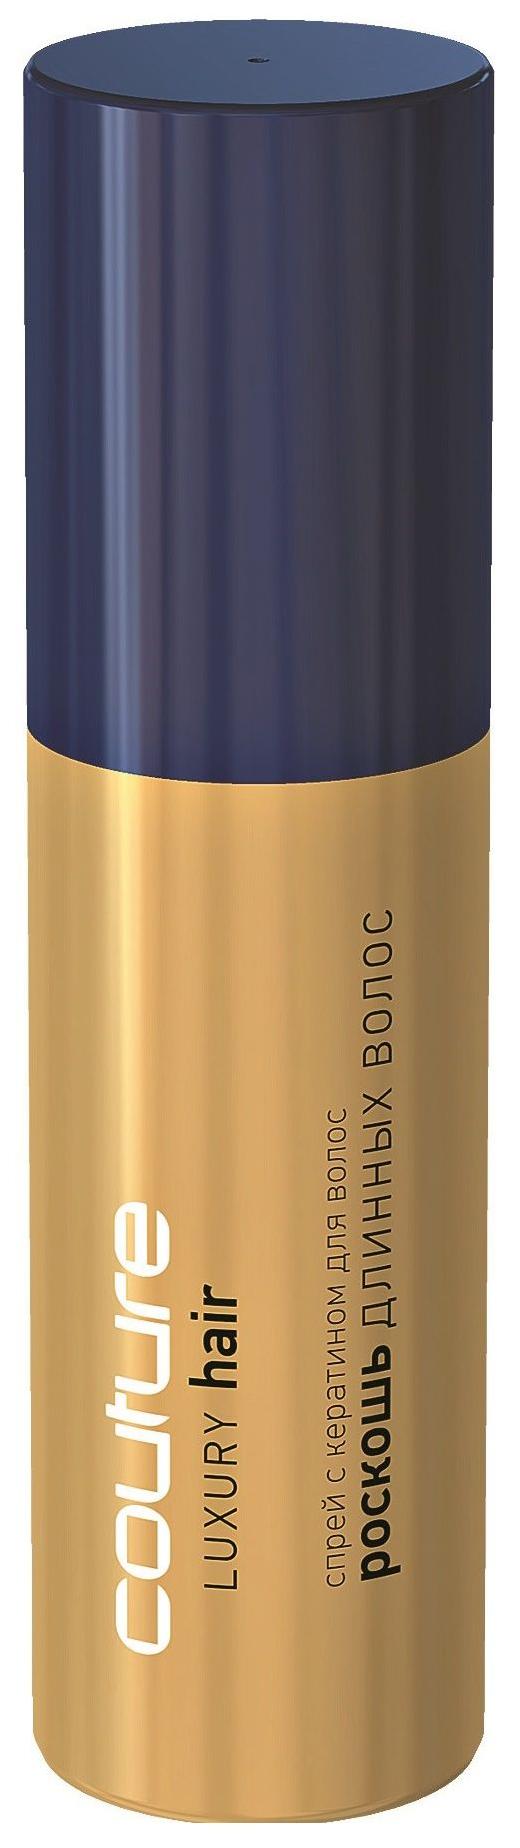 Спрей с кератином для волос Estel Professional Luxury Hair Estel Haute Couture 100 мл